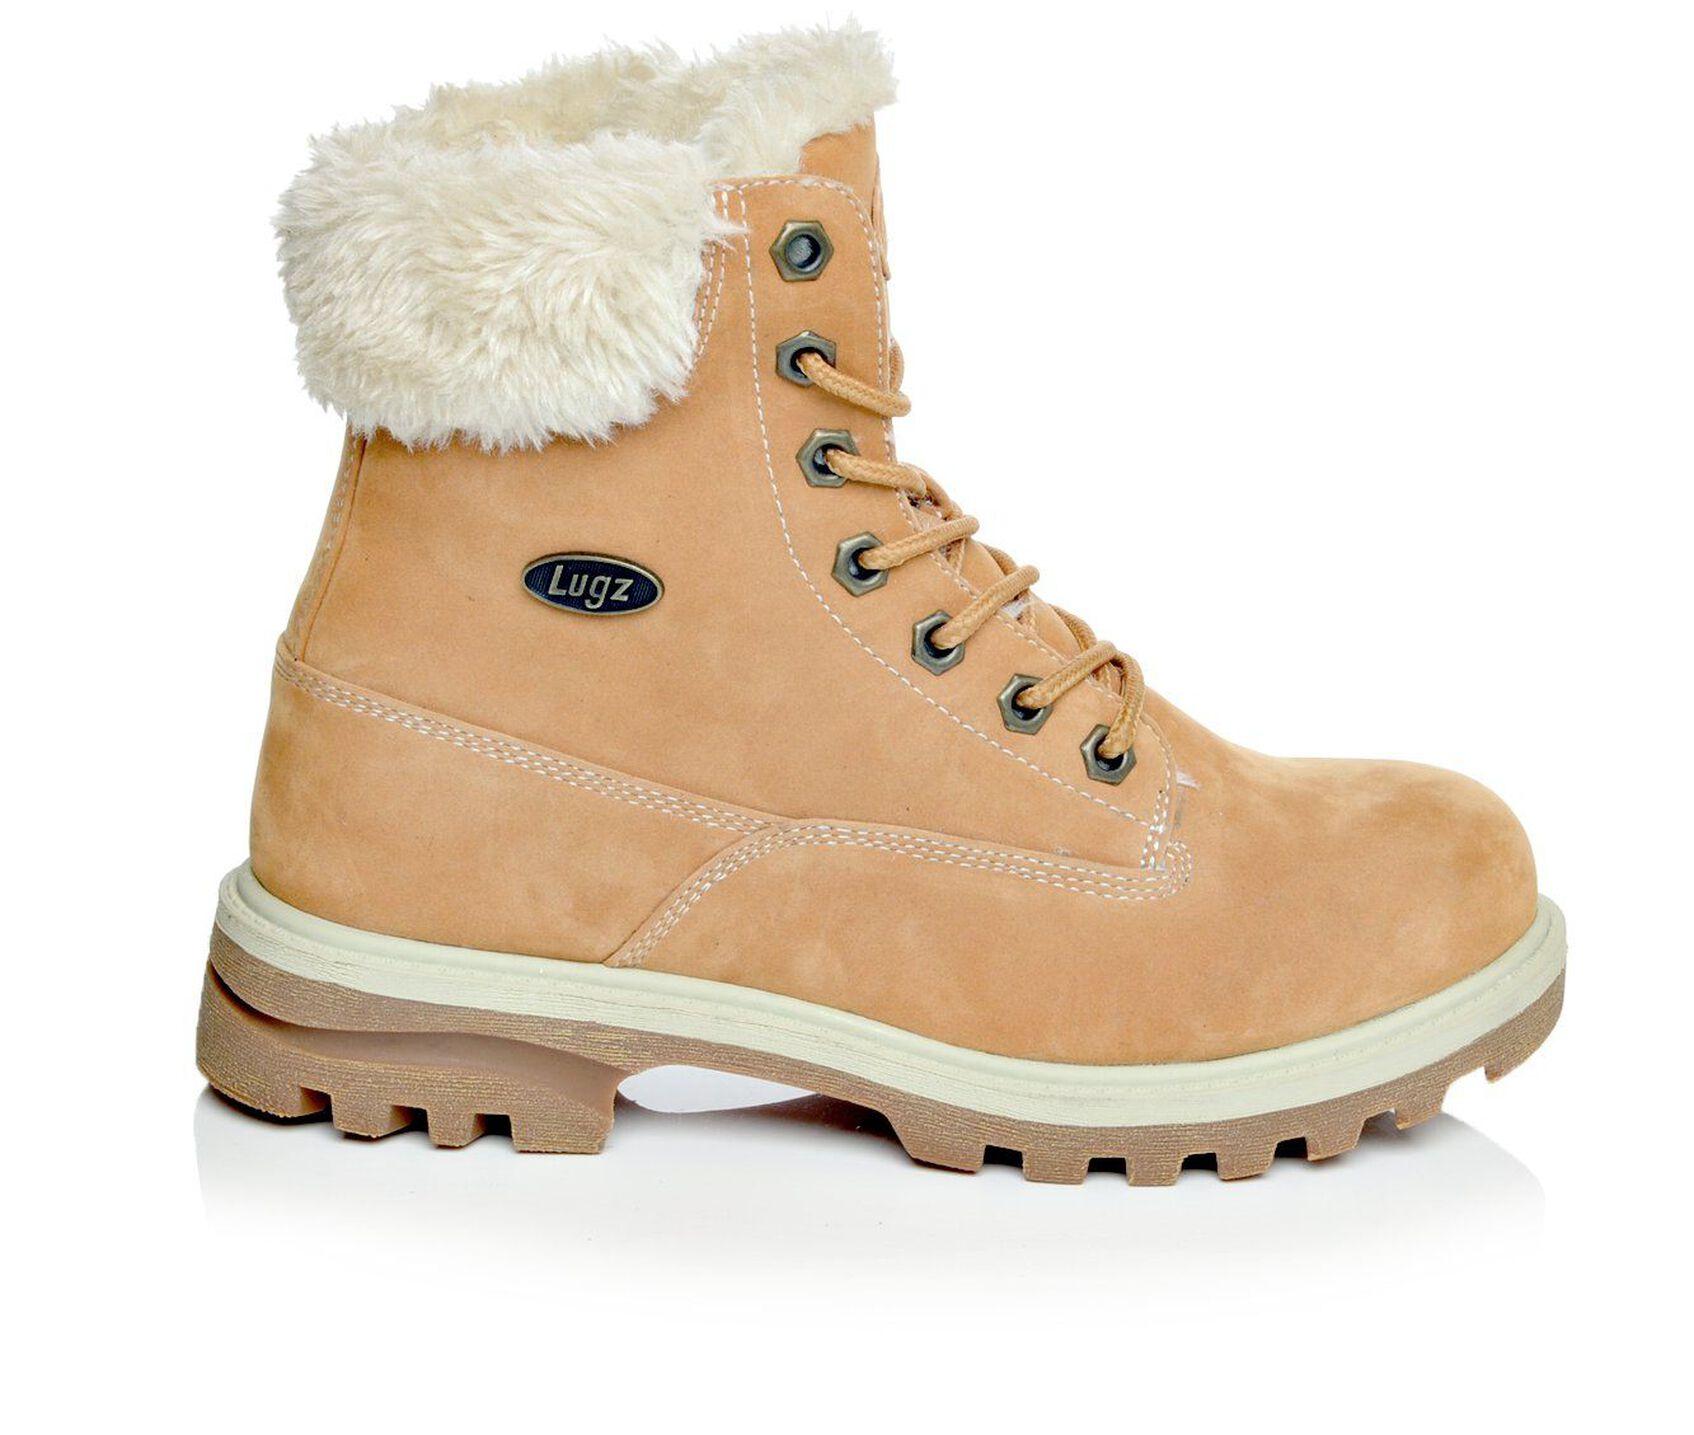 c953e8de8f656 Women s Lugz Empire Hi Fur Hiking Boots